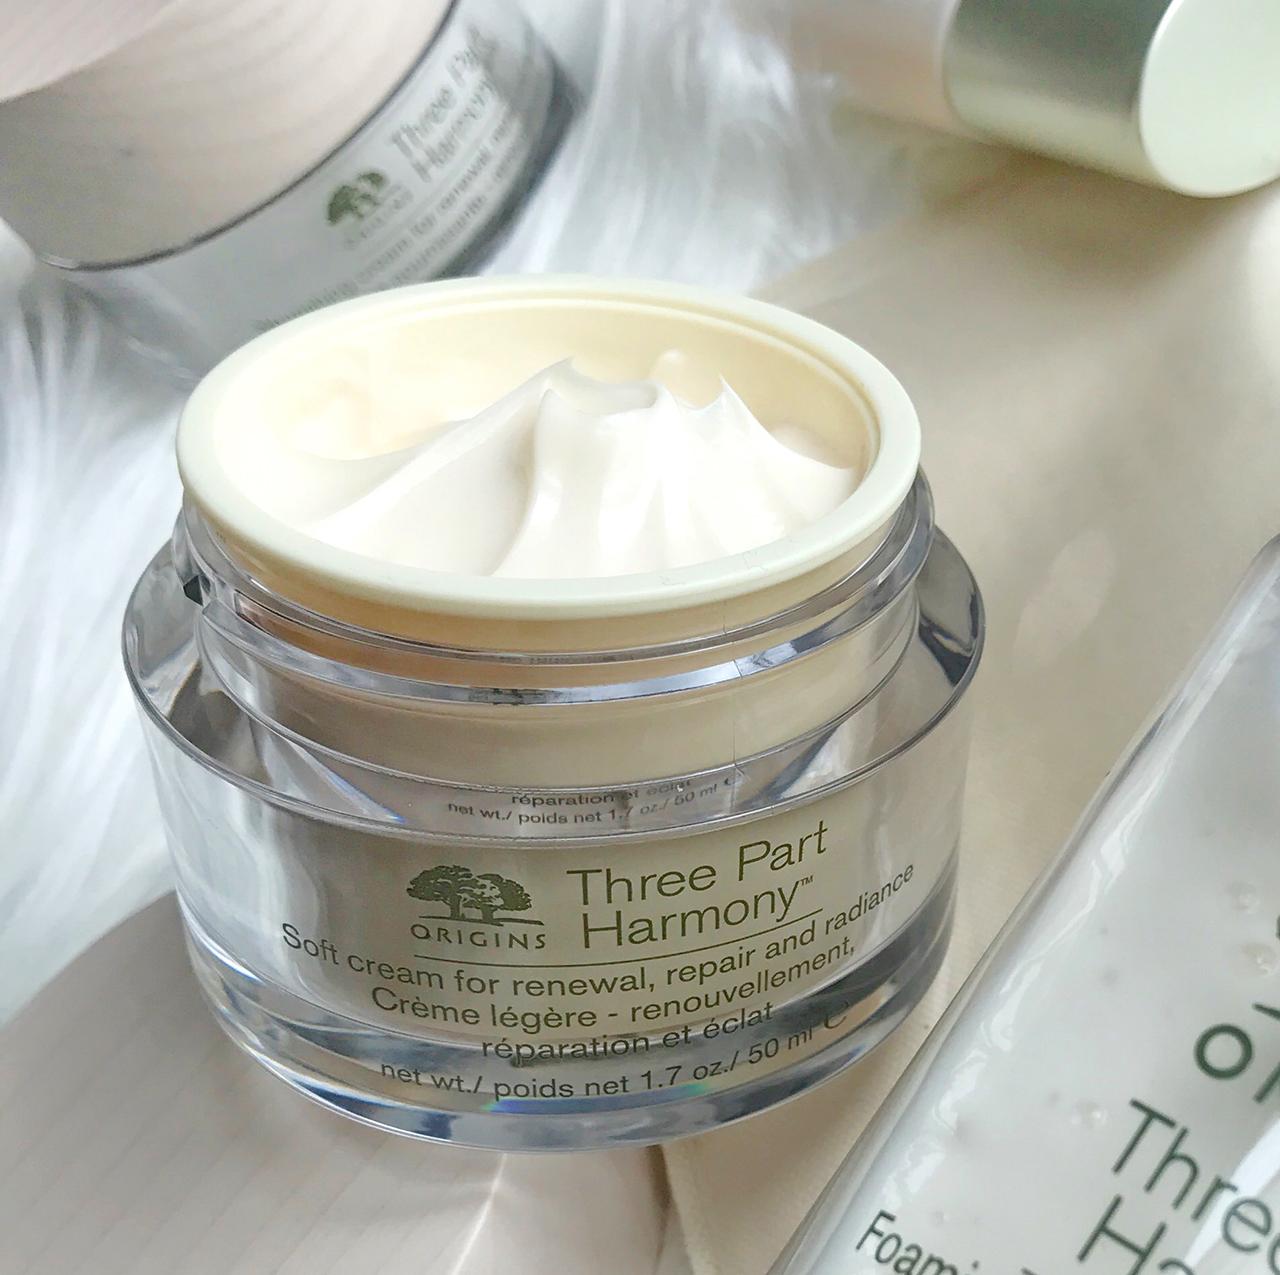 Origins Three Part Harmony Soft Cream